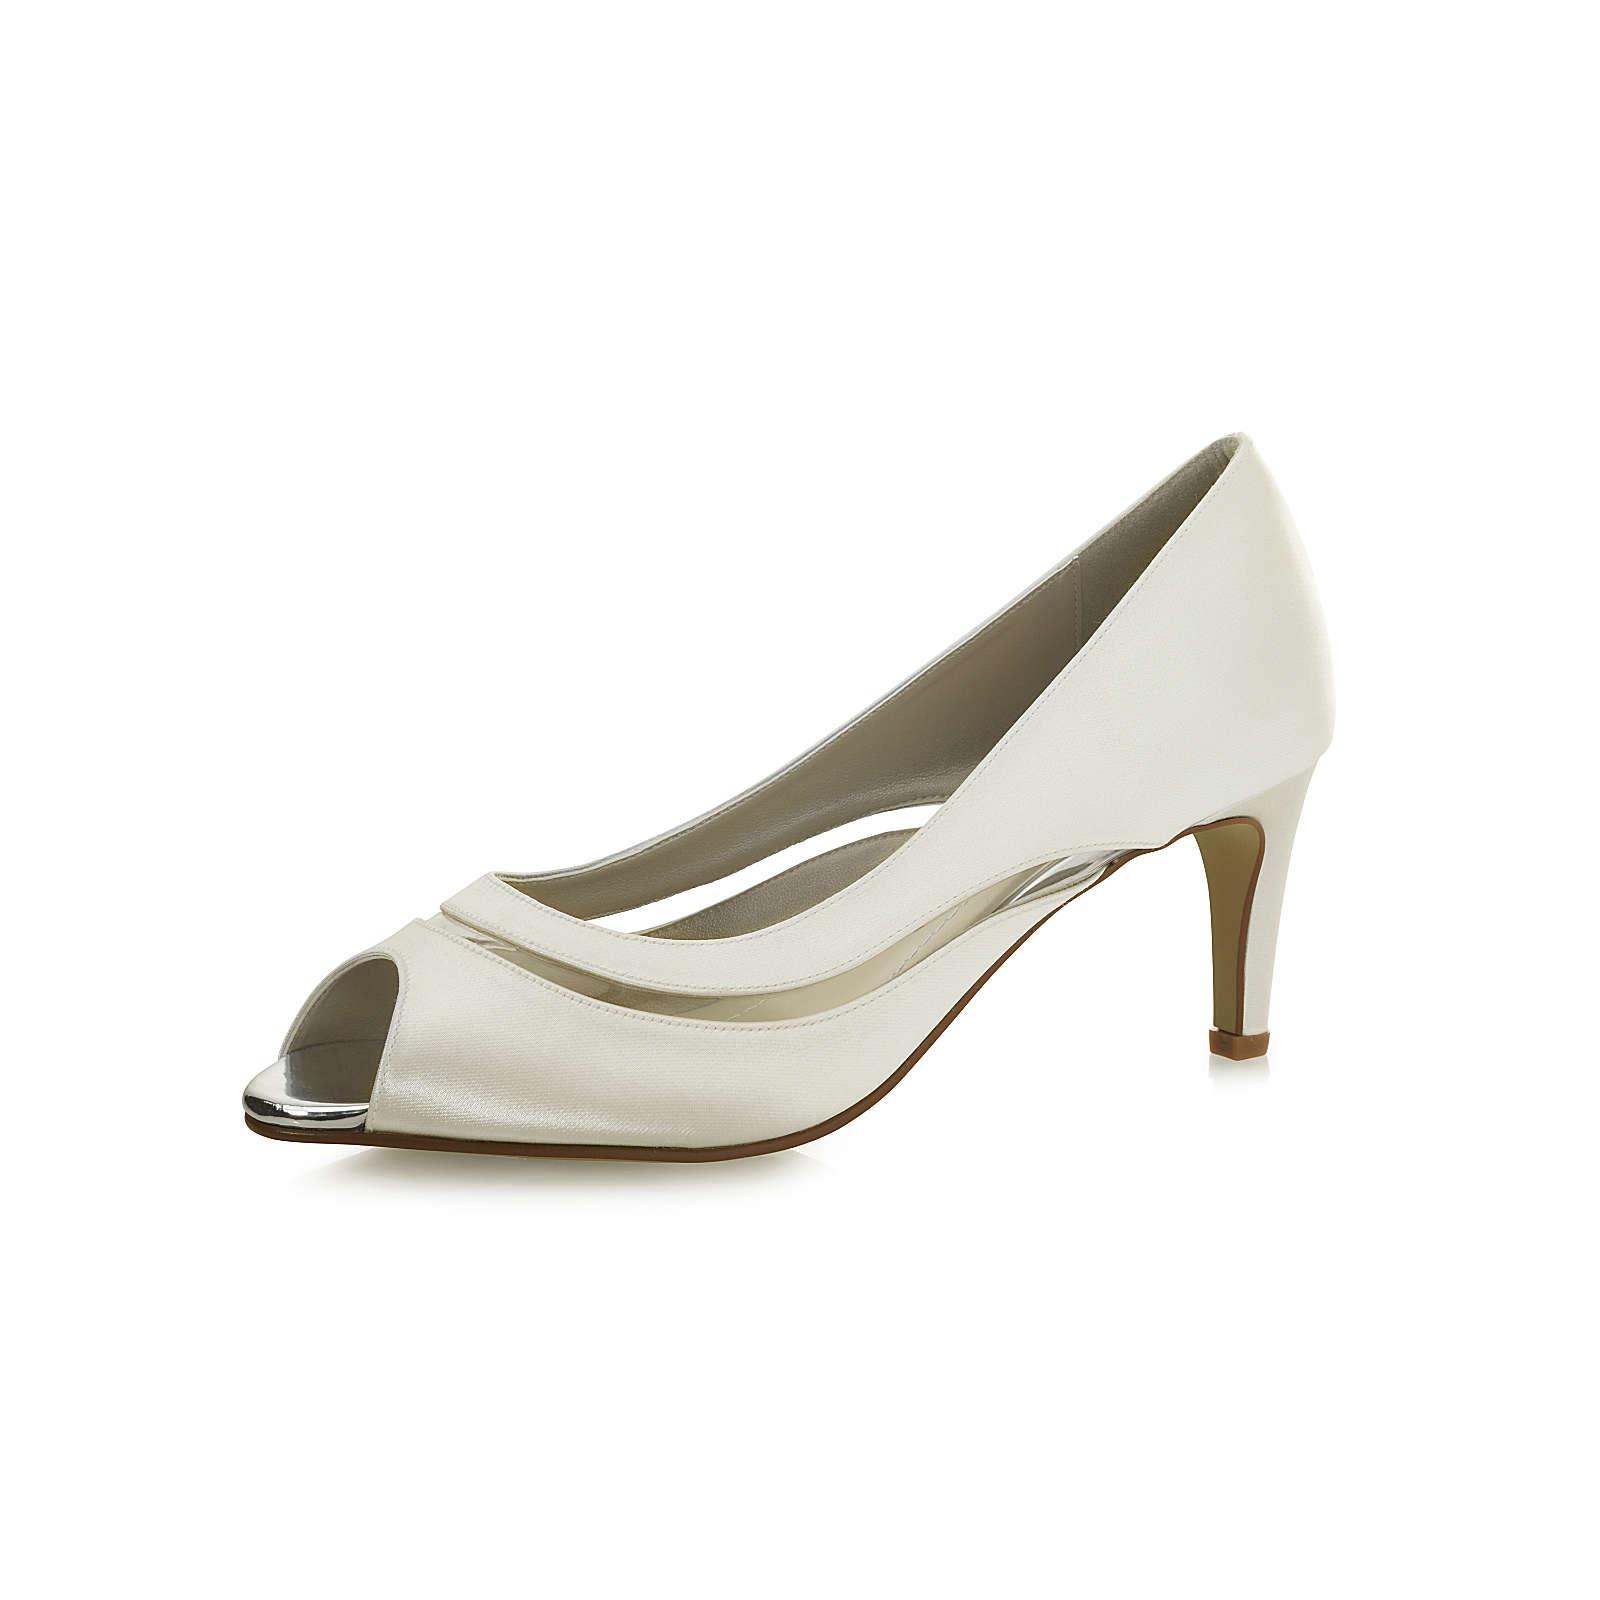 Elsa Coloured Shoes Rainbow Club Brautschuhe Cressida Peeptoe-Pumps creme Damen Gr. 40,5